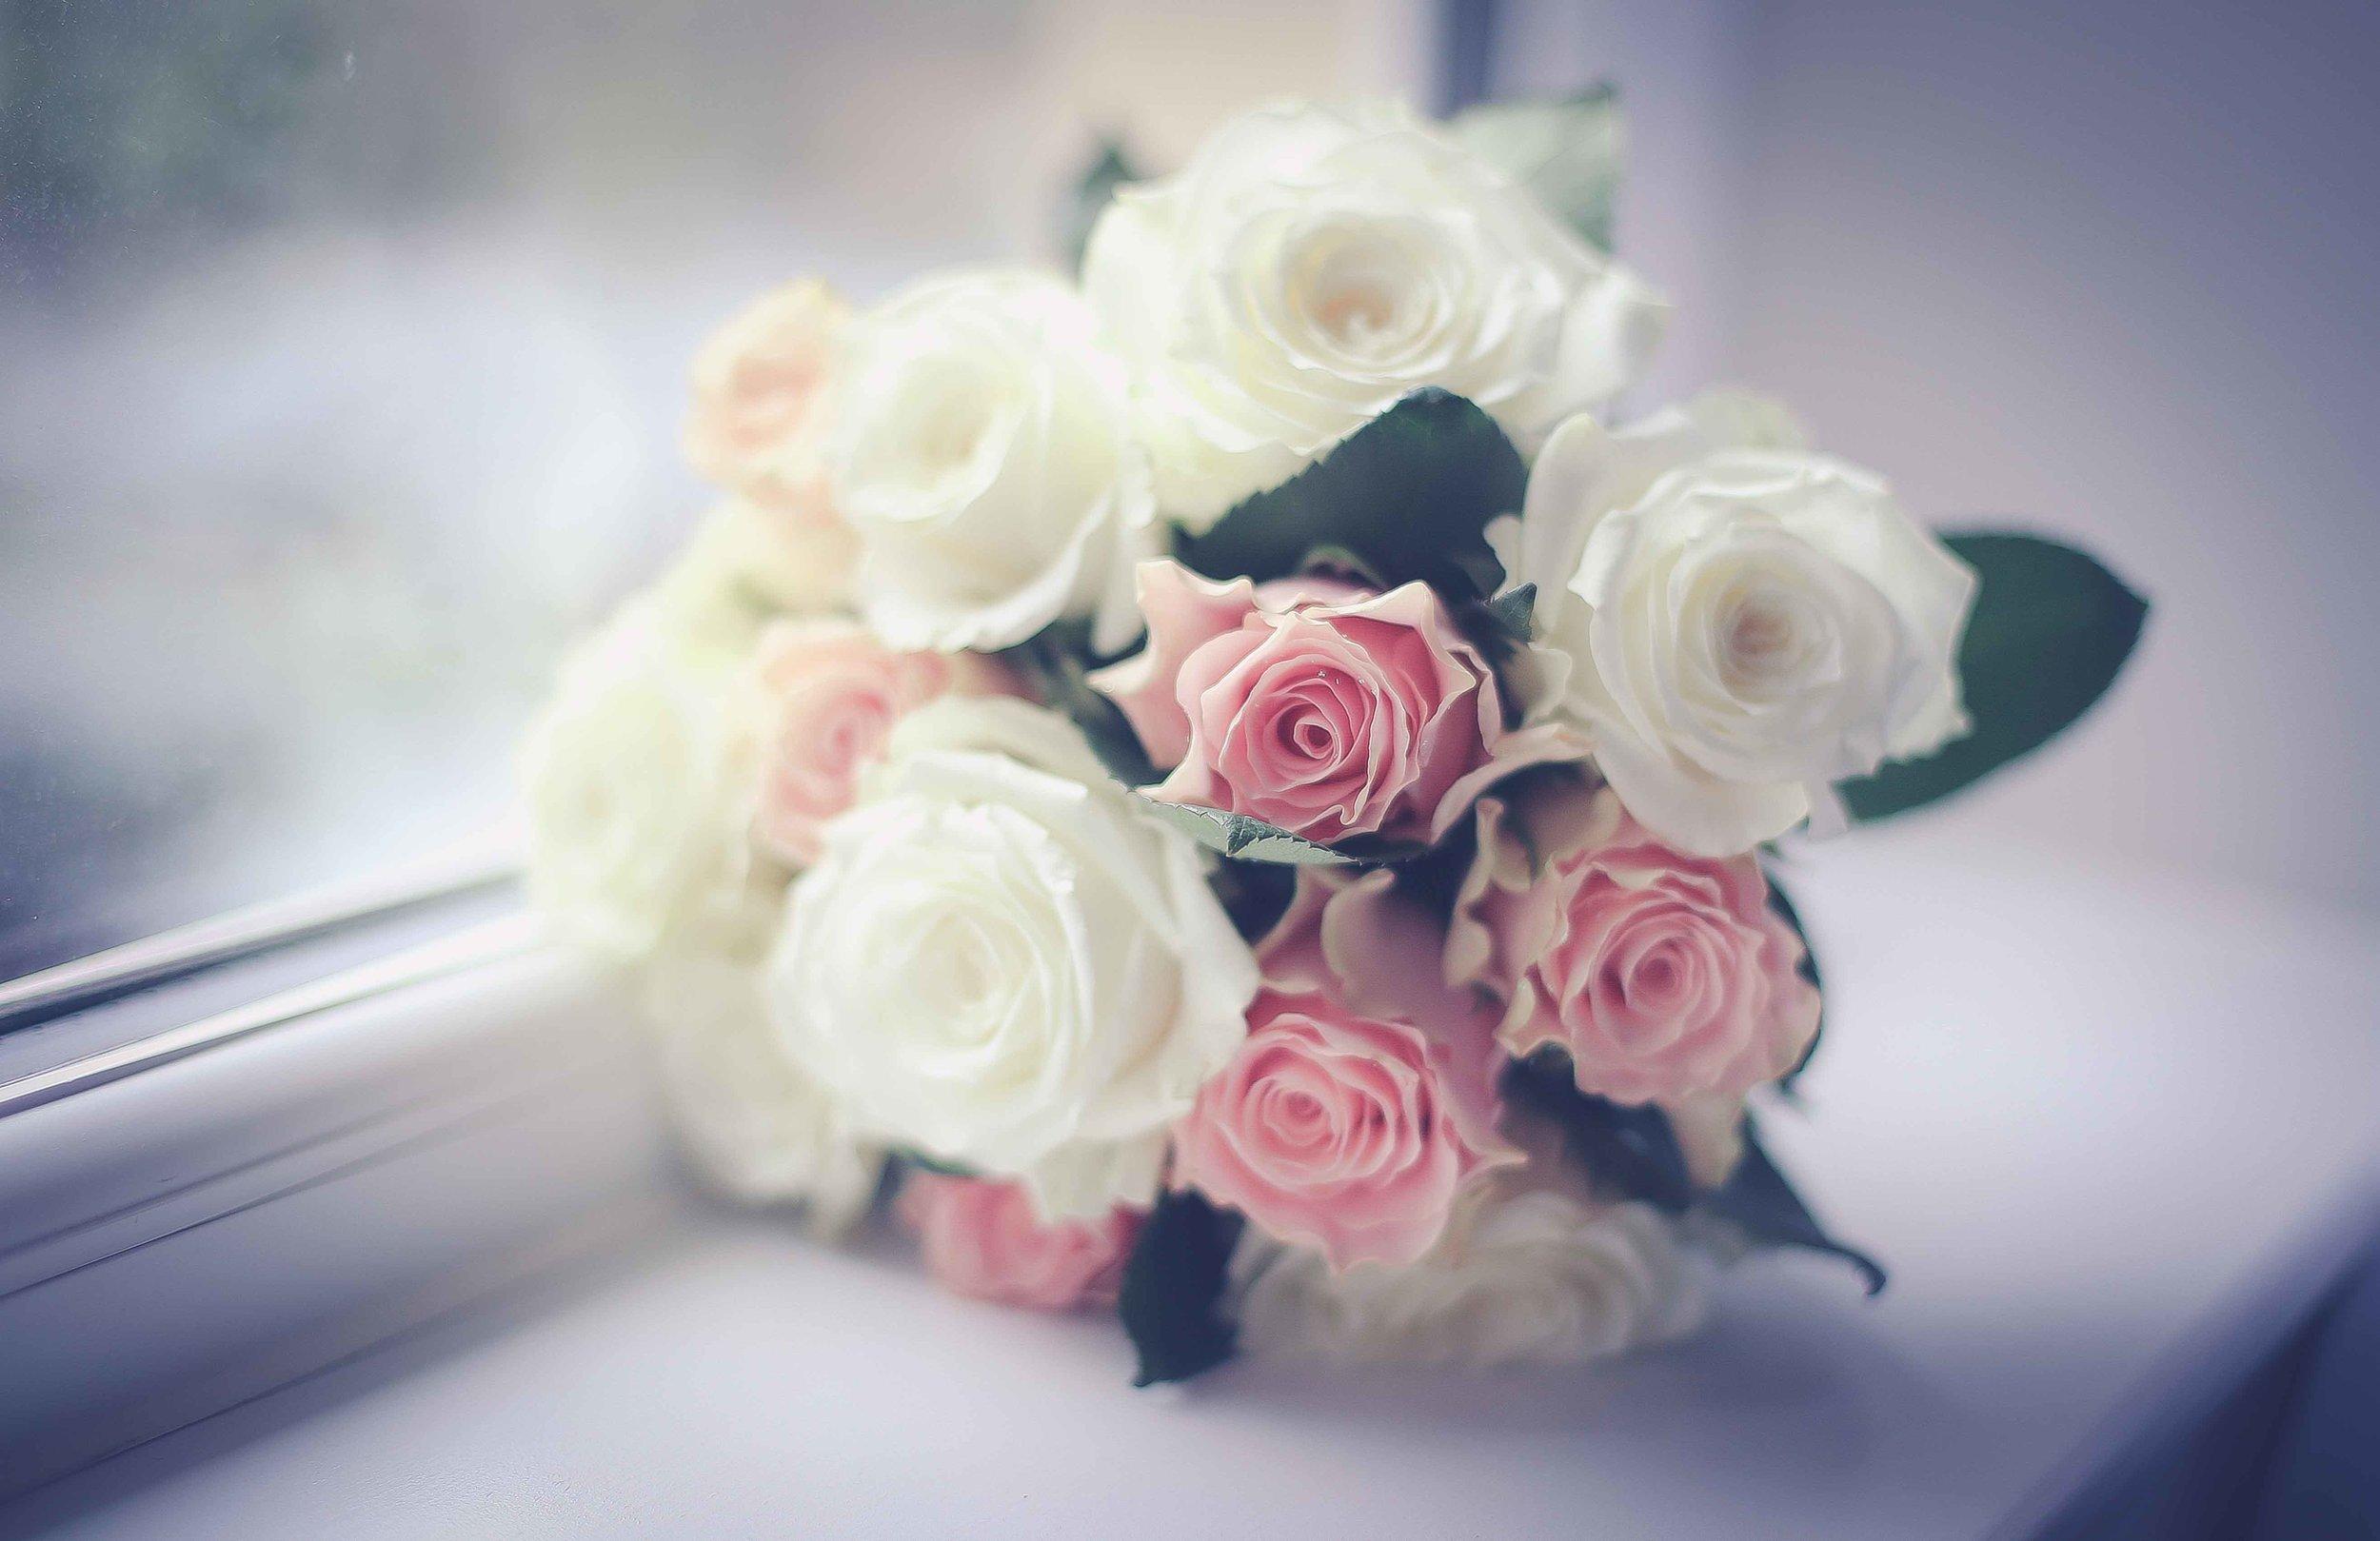 Knutsford Wedding-1-39.jpg